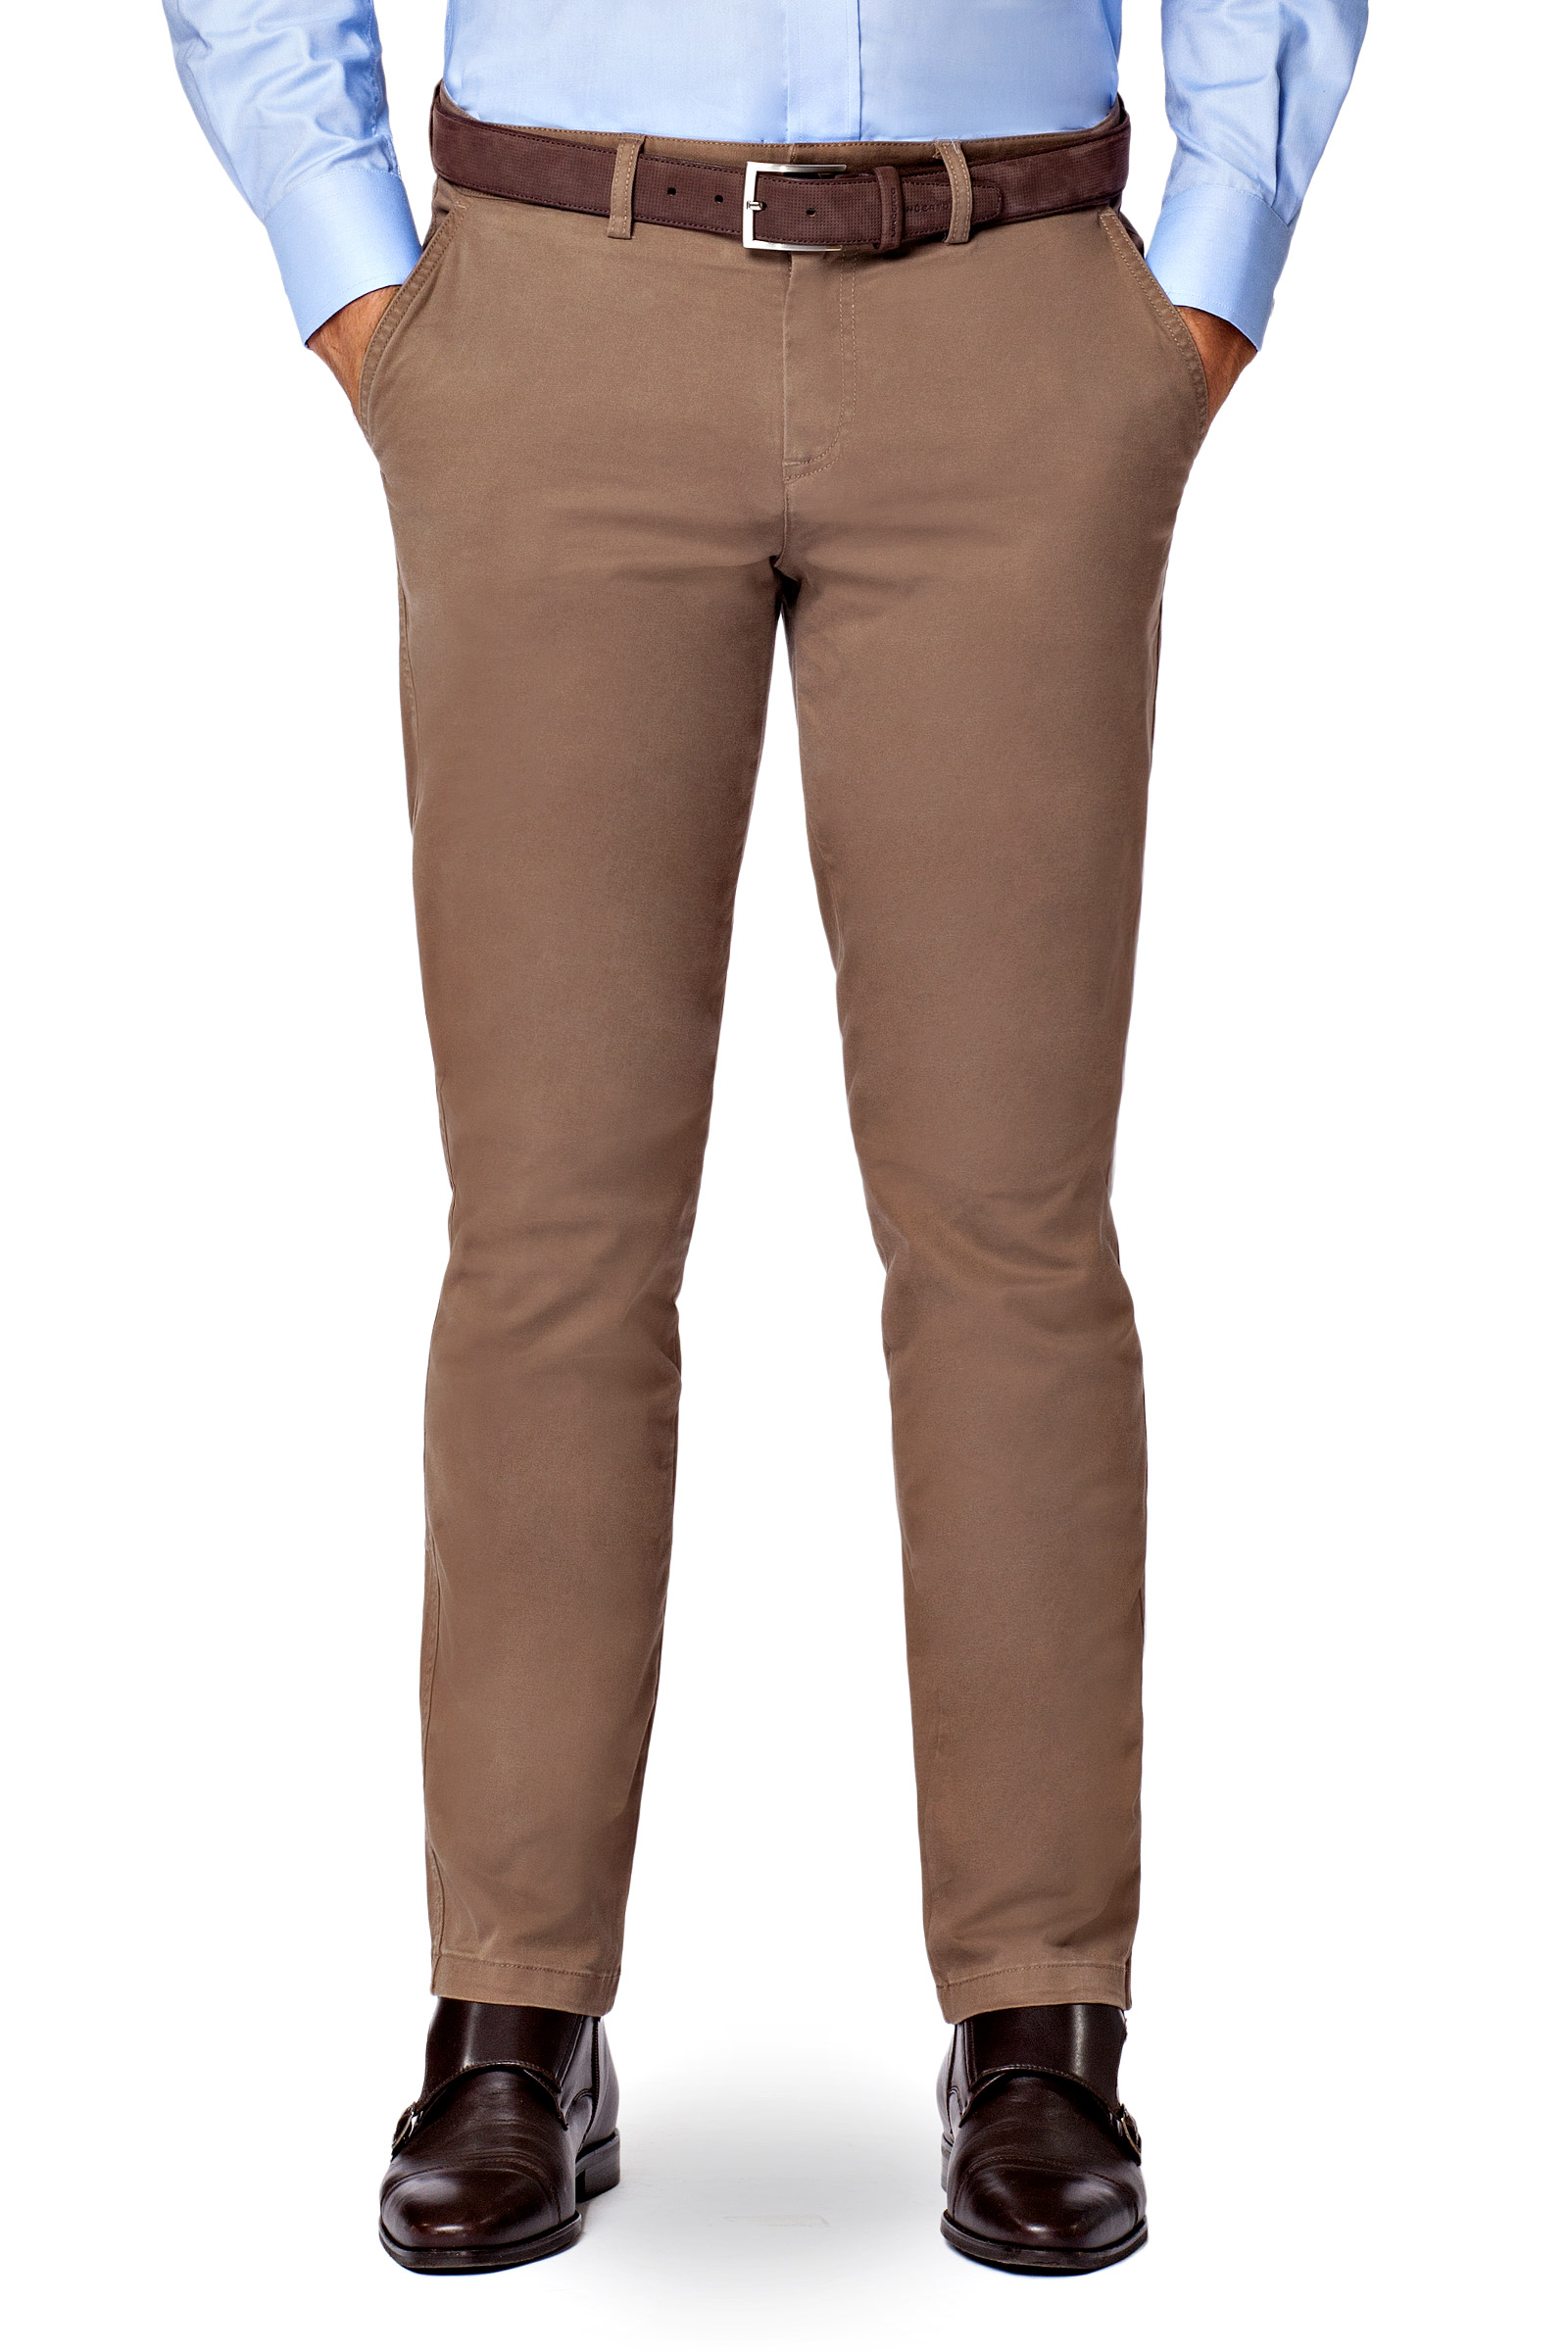 9fc41096 Spodnie Męskie Lancerto Chino Mono Beż 182/86 - 6994746047 ...